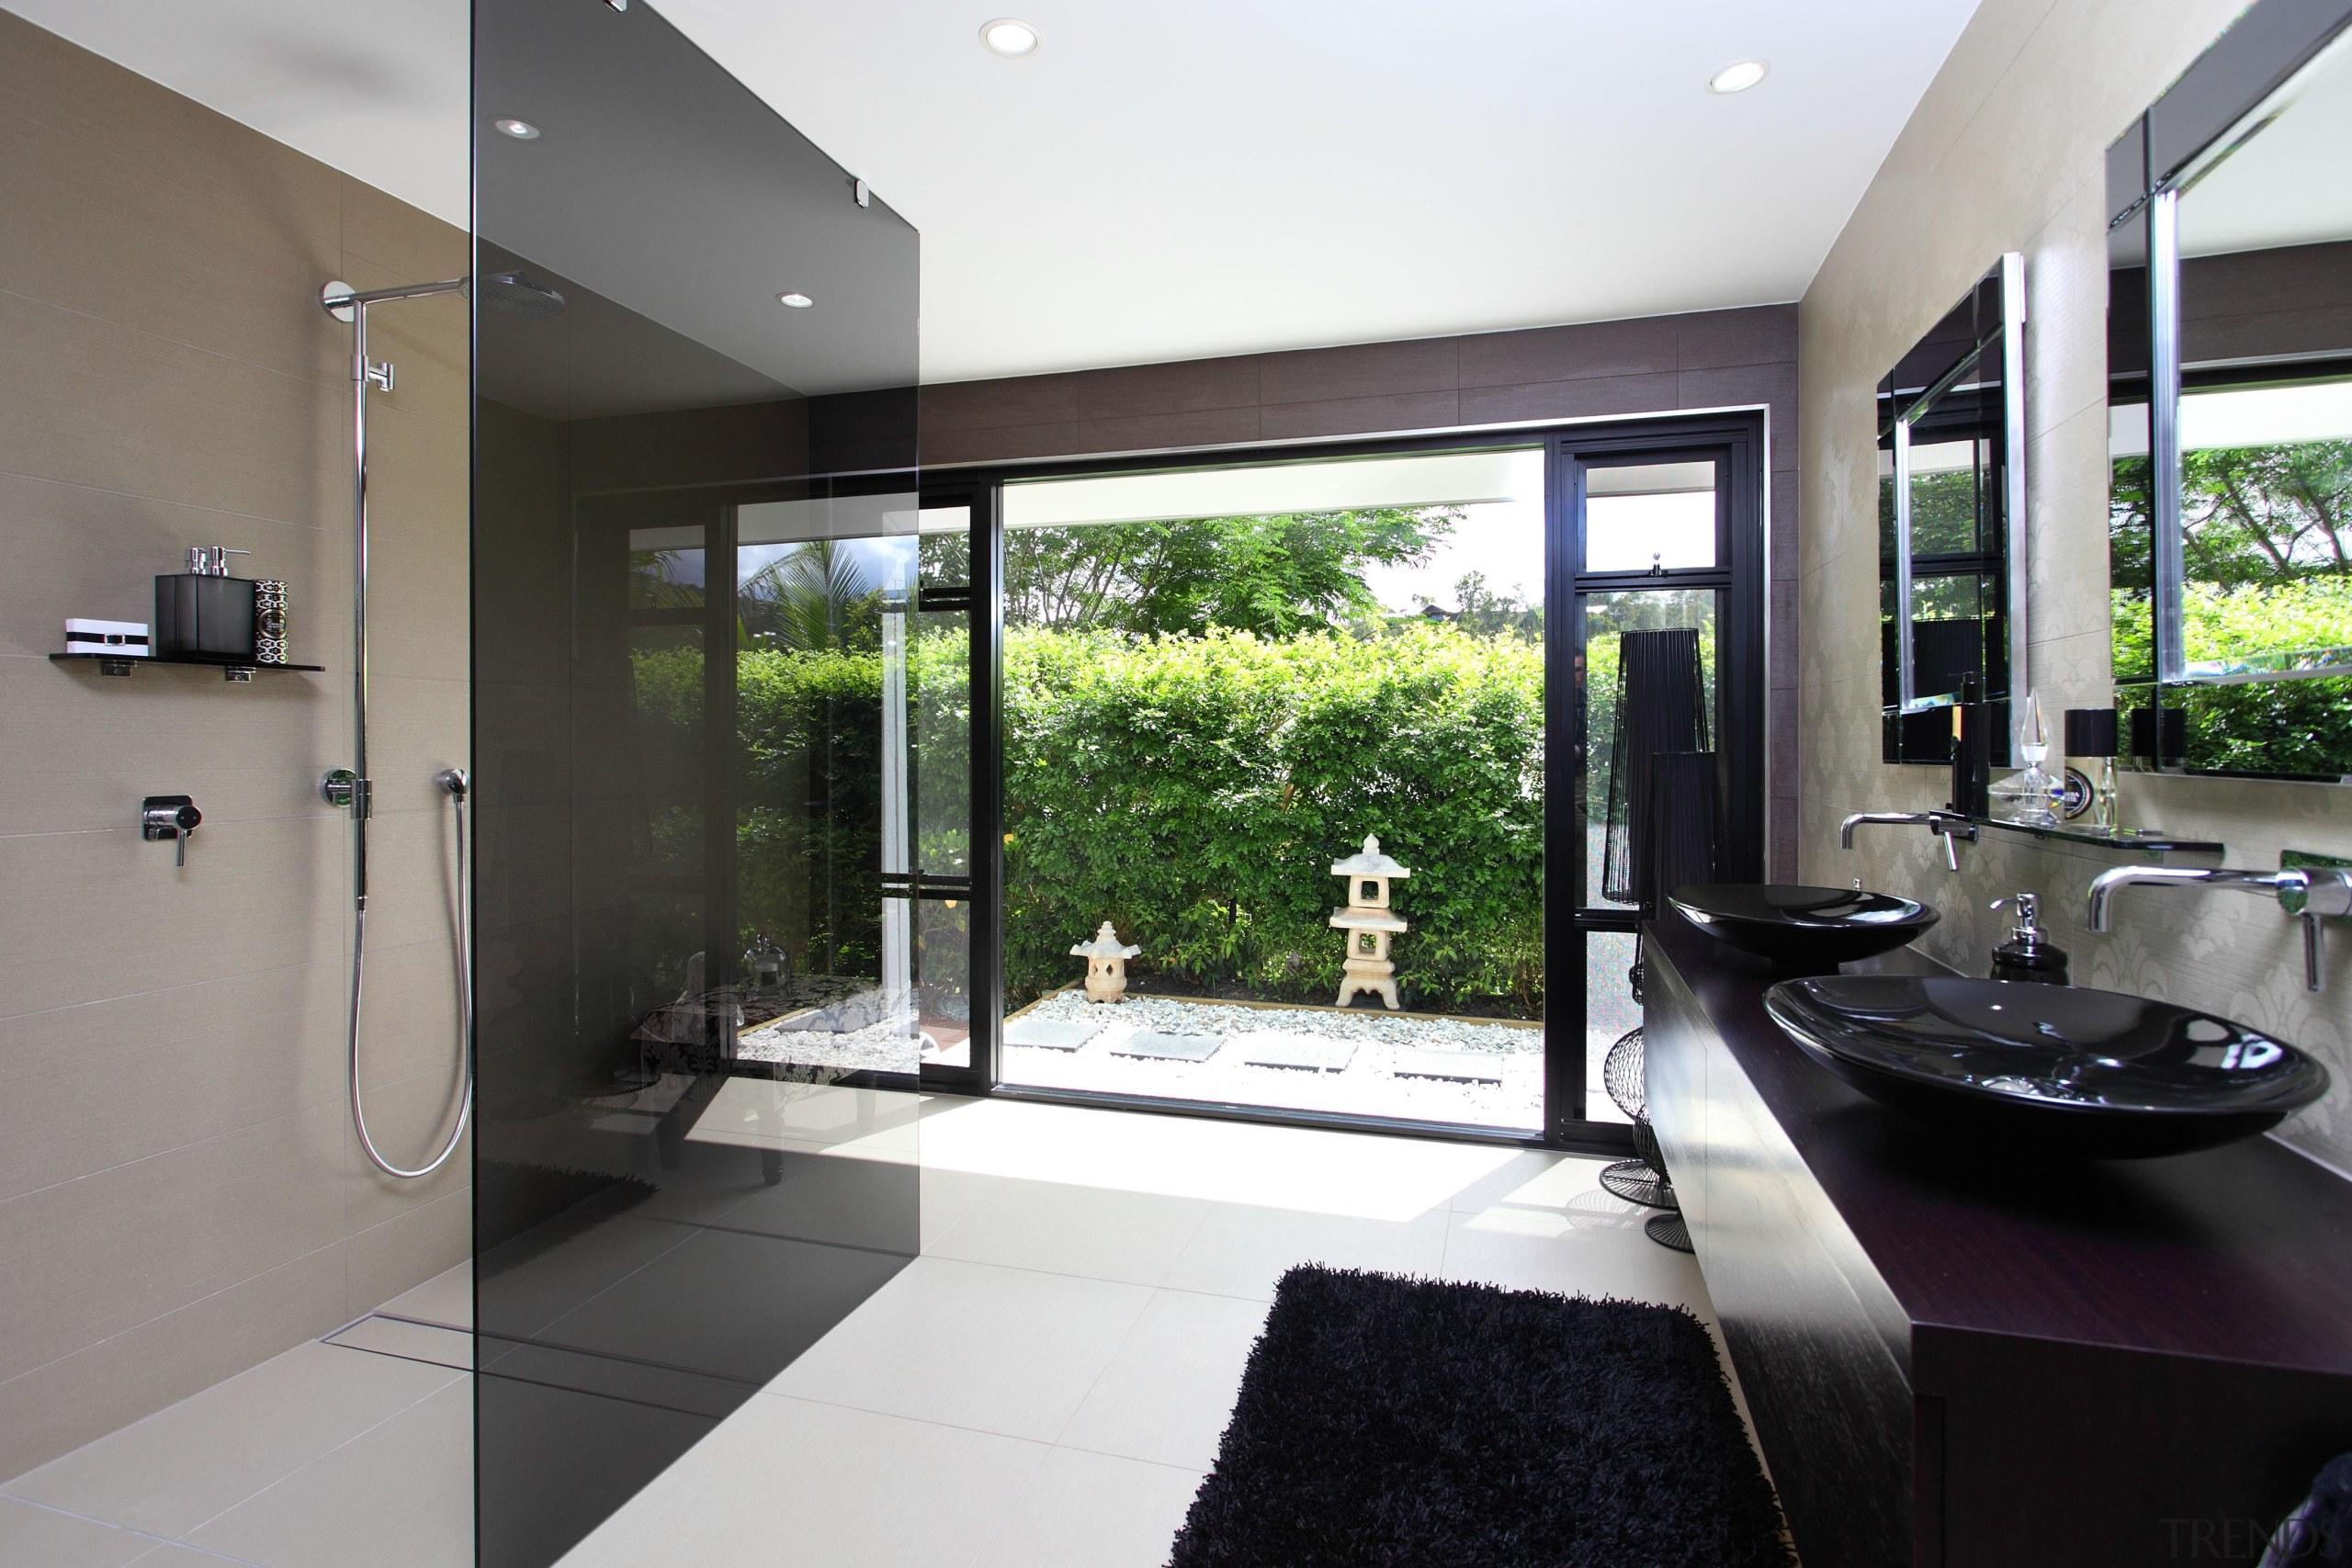 Winner Bathroom Design of the Year Queensland 2013 architecture, estate, floor, house, interior design, property, real estate, window, white, black, gray